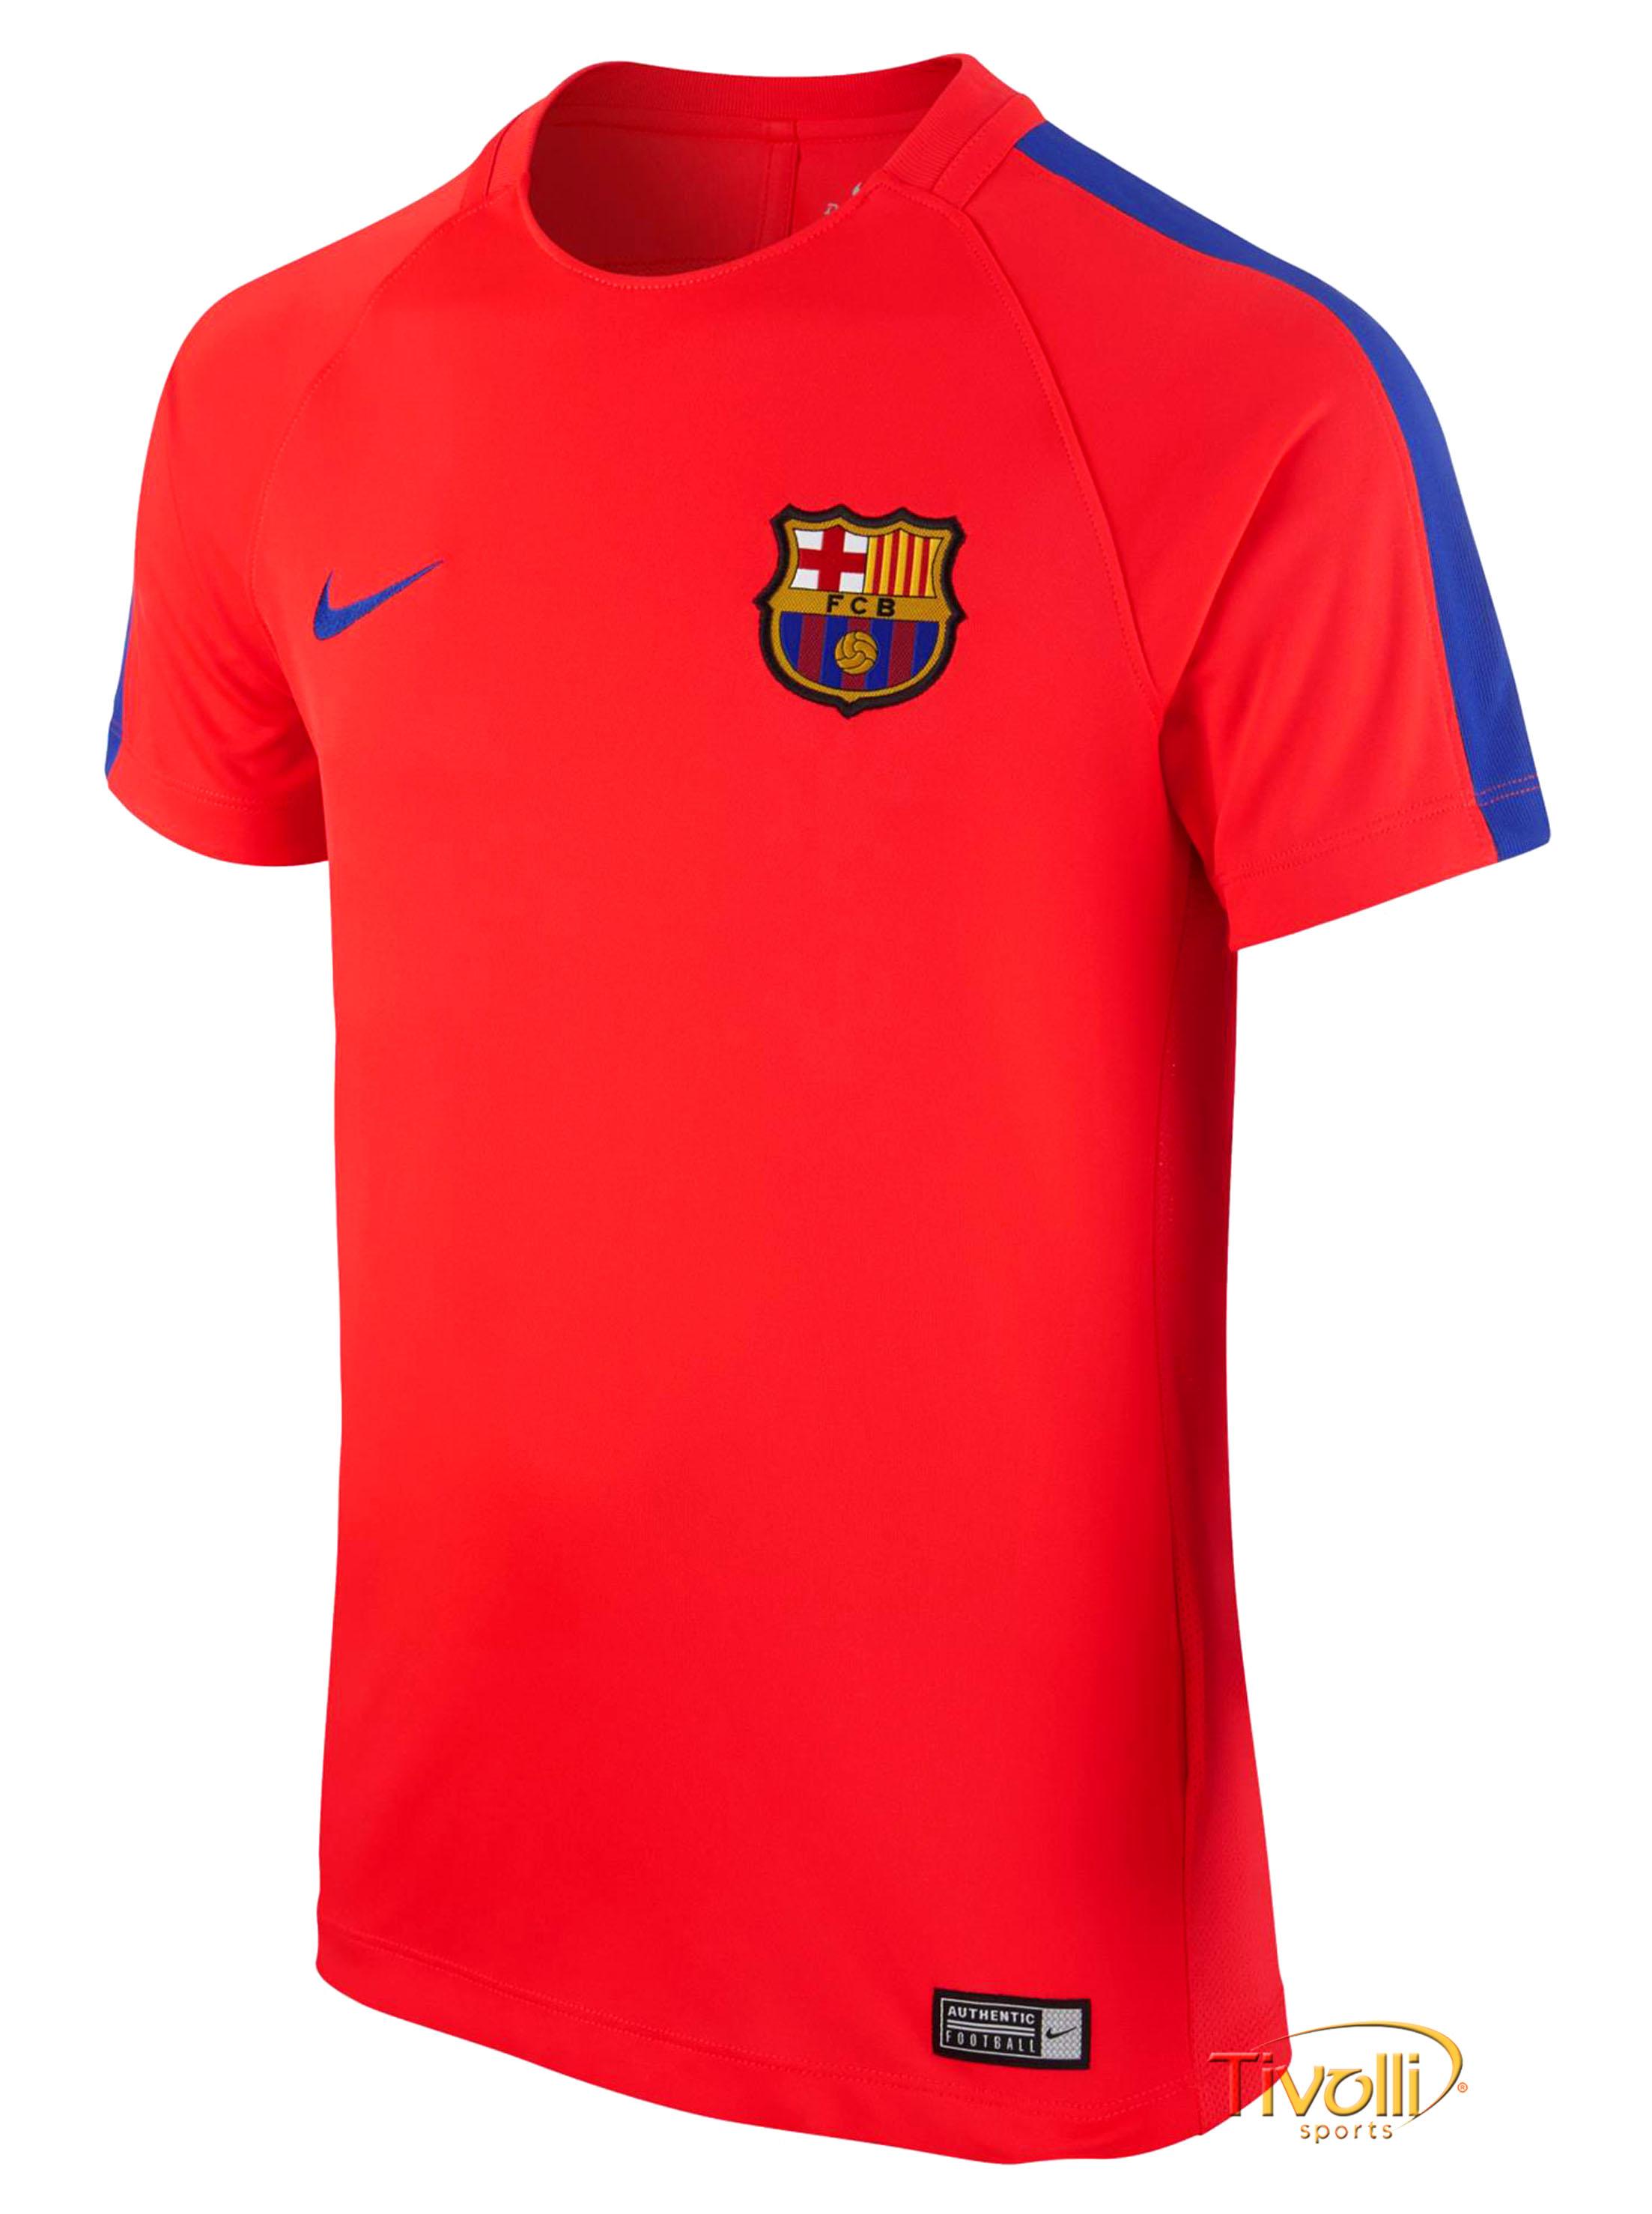 cd4eb4ebfe Camiseta Barcelona Dry Top Squad Nike Infantil   Coral e Azul